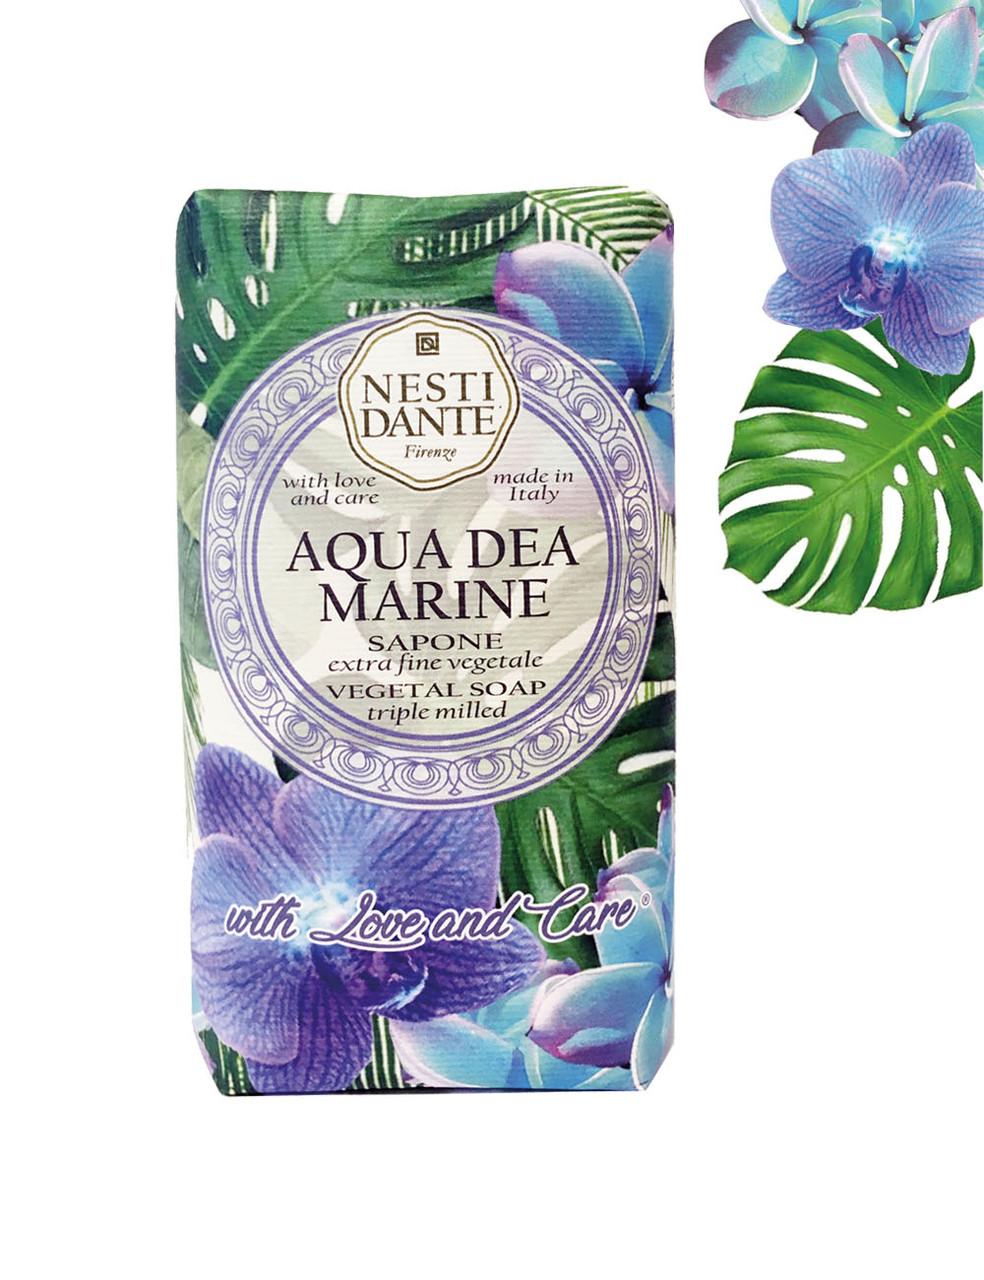 Nesti Dante Aqua Dea Marine Мило Несті Данте Богиня морів 250гр